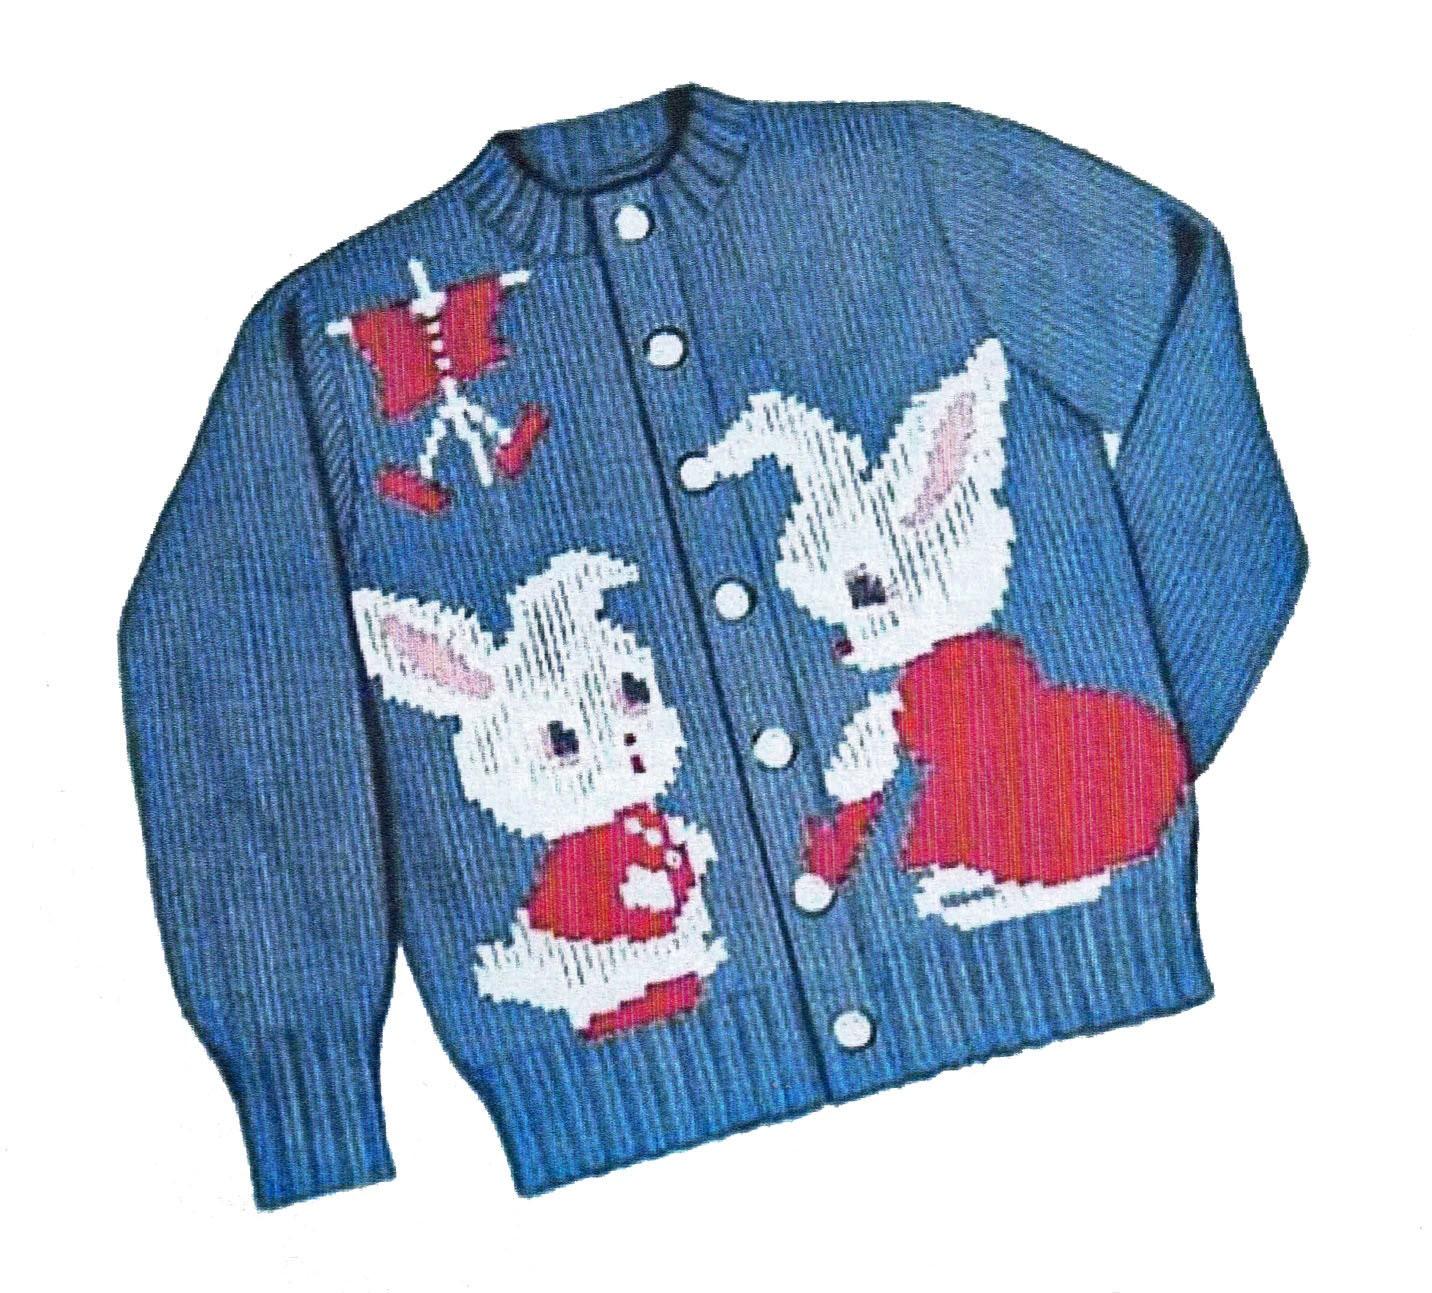 Peter Rabbit Sweater PATTERN Knit O Graf 203 cardigan pullover